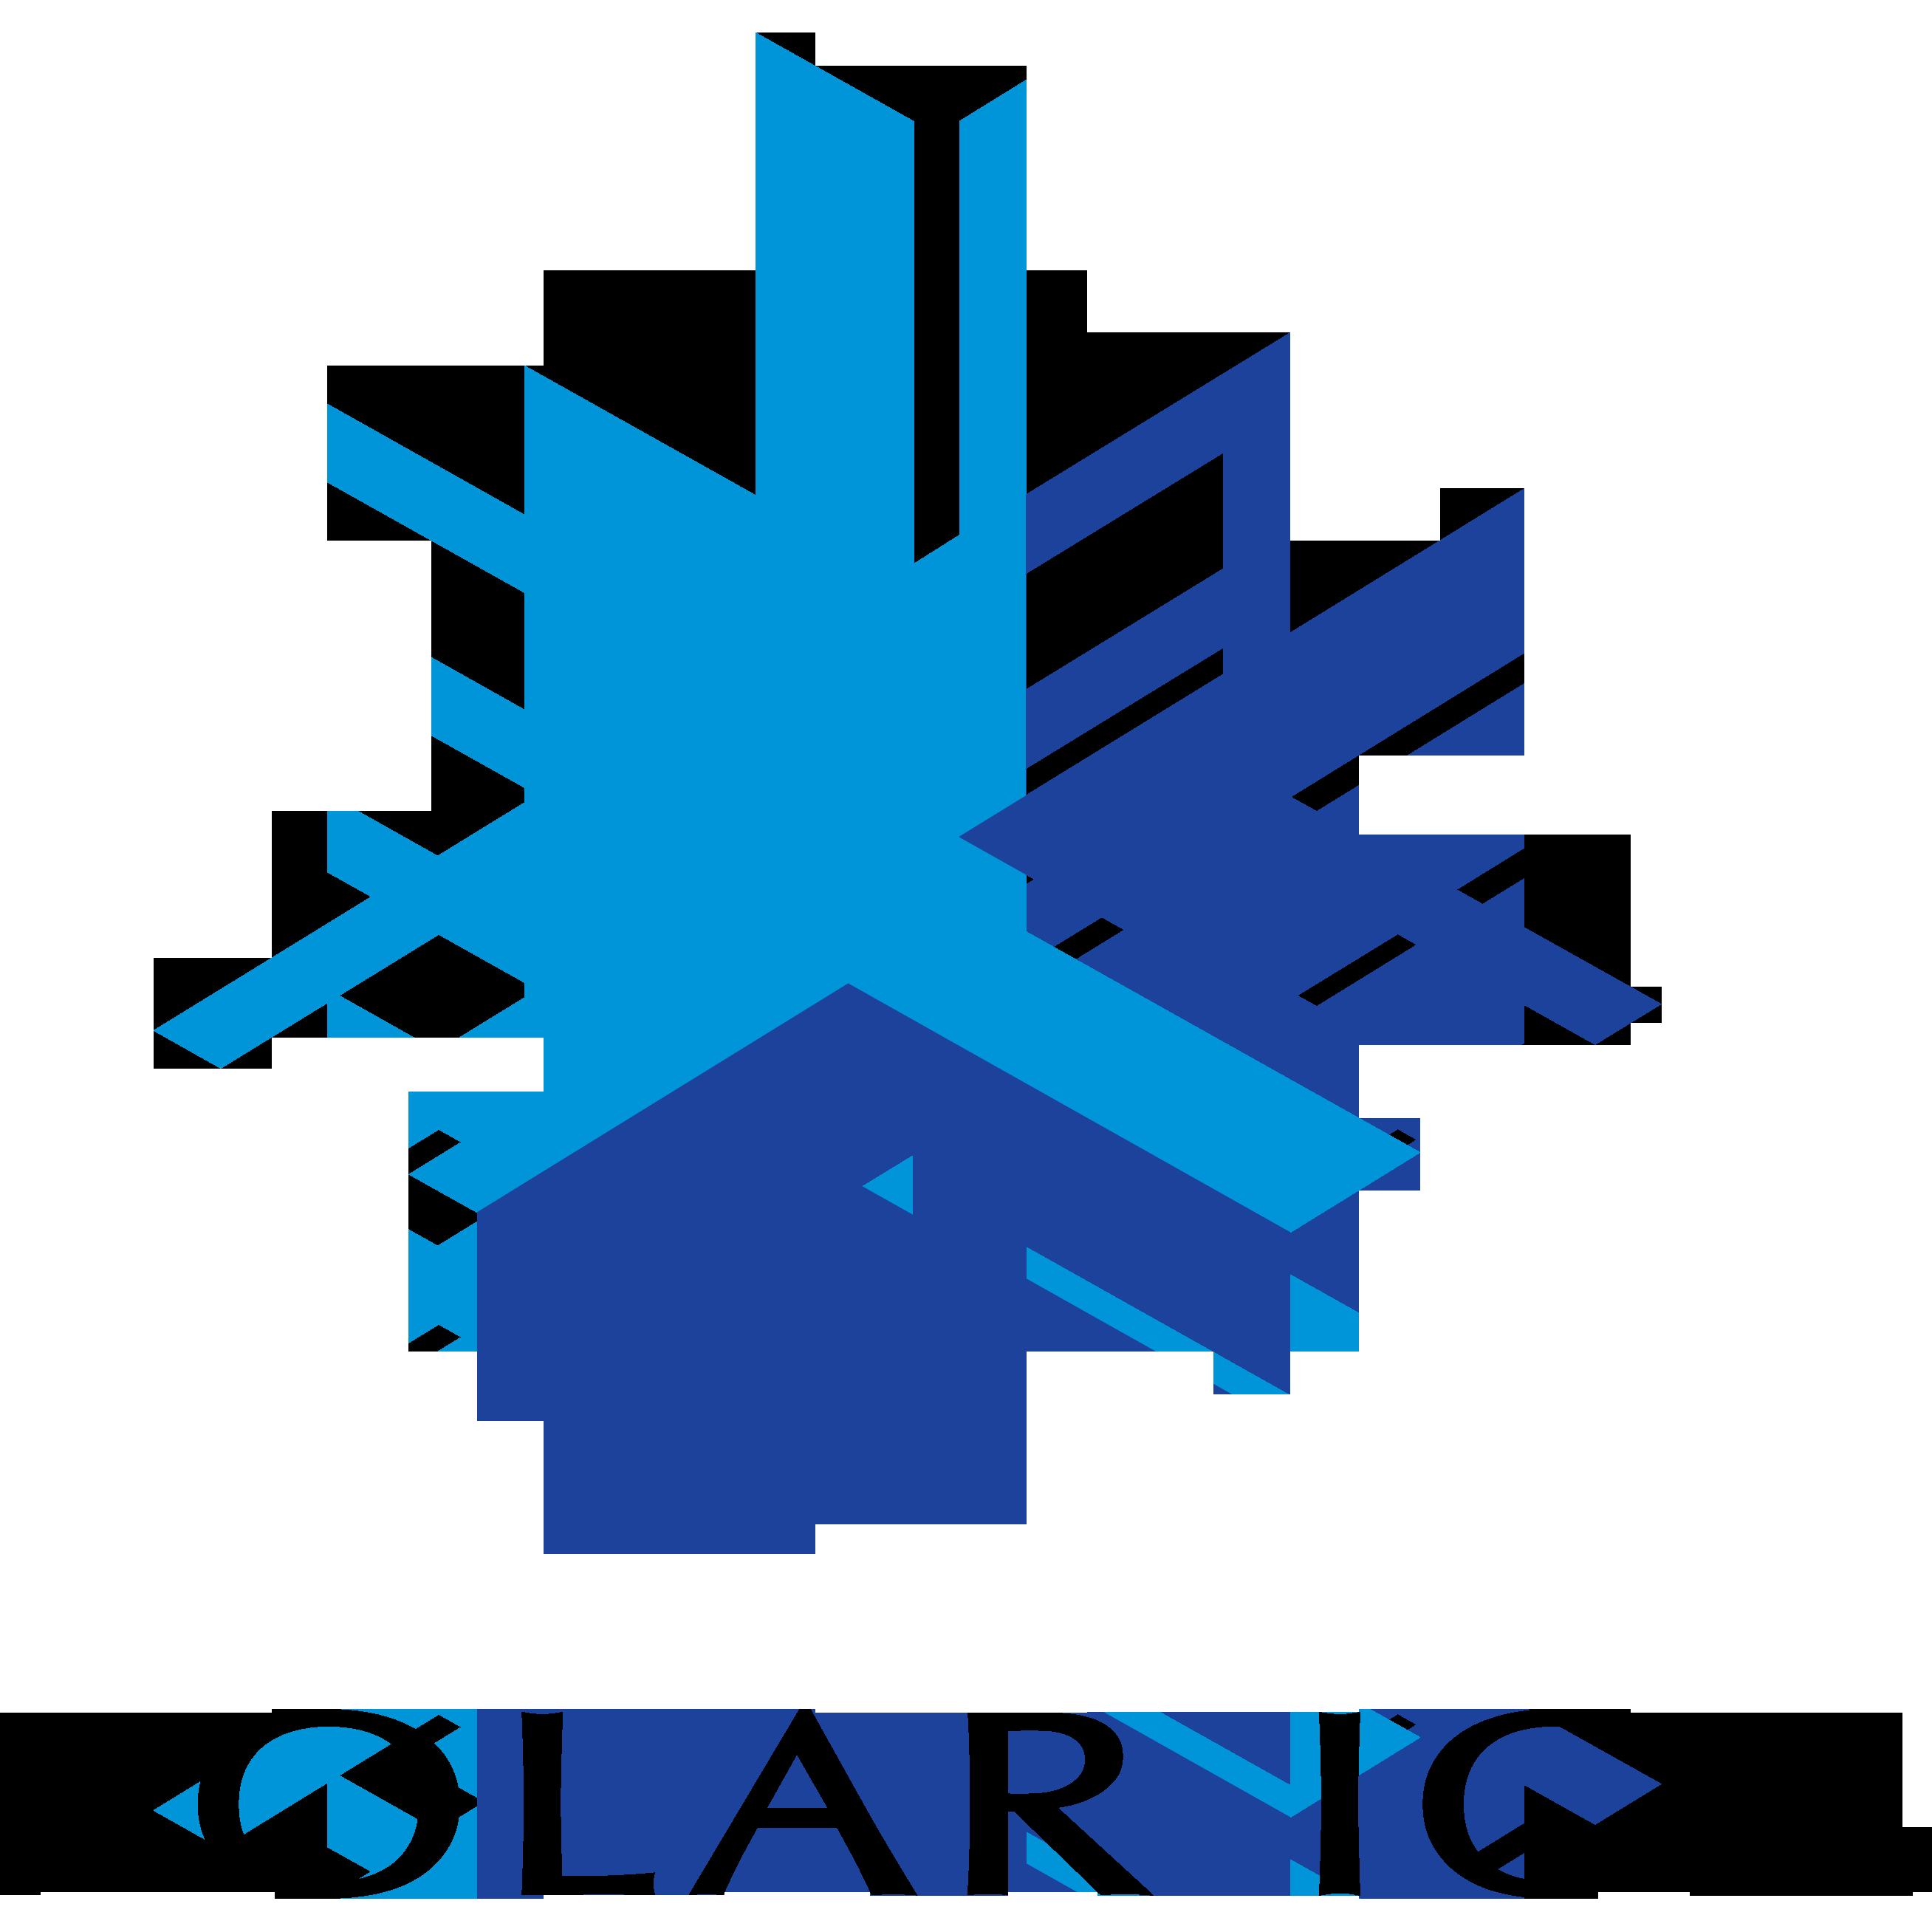 Polar_Ice_Logo.png